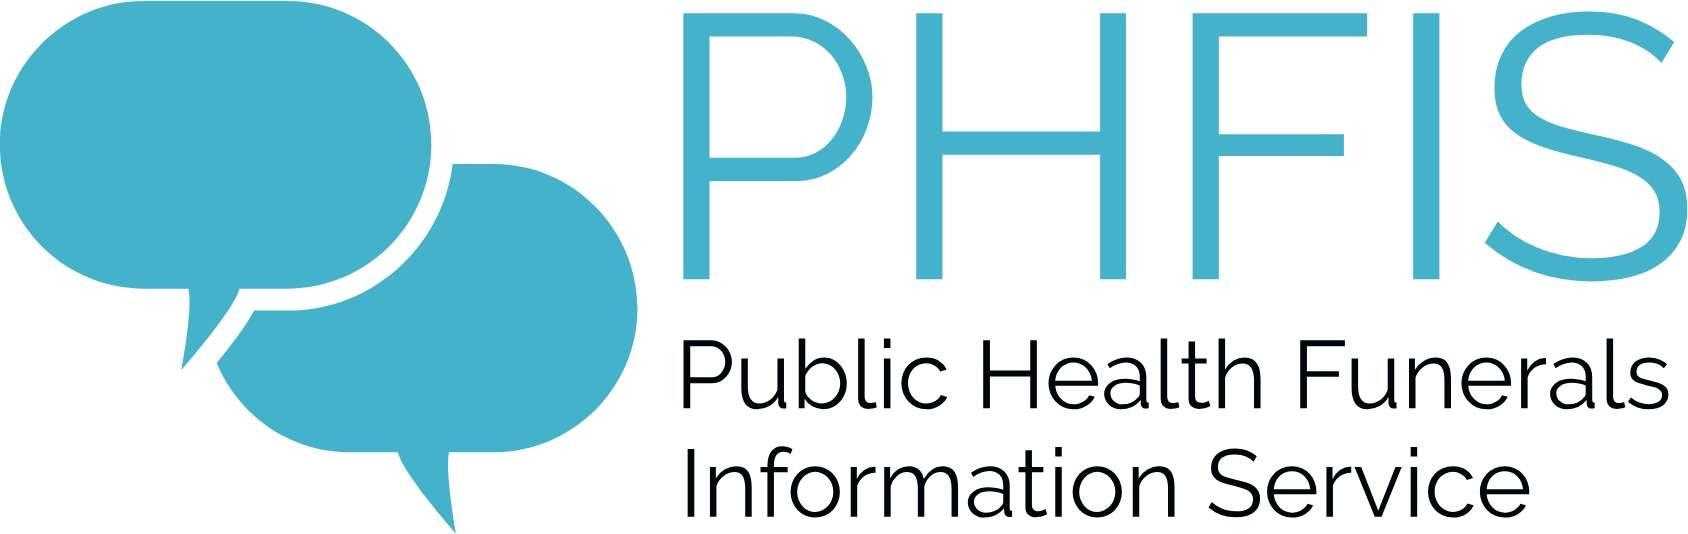 Public Health Funerals Logo